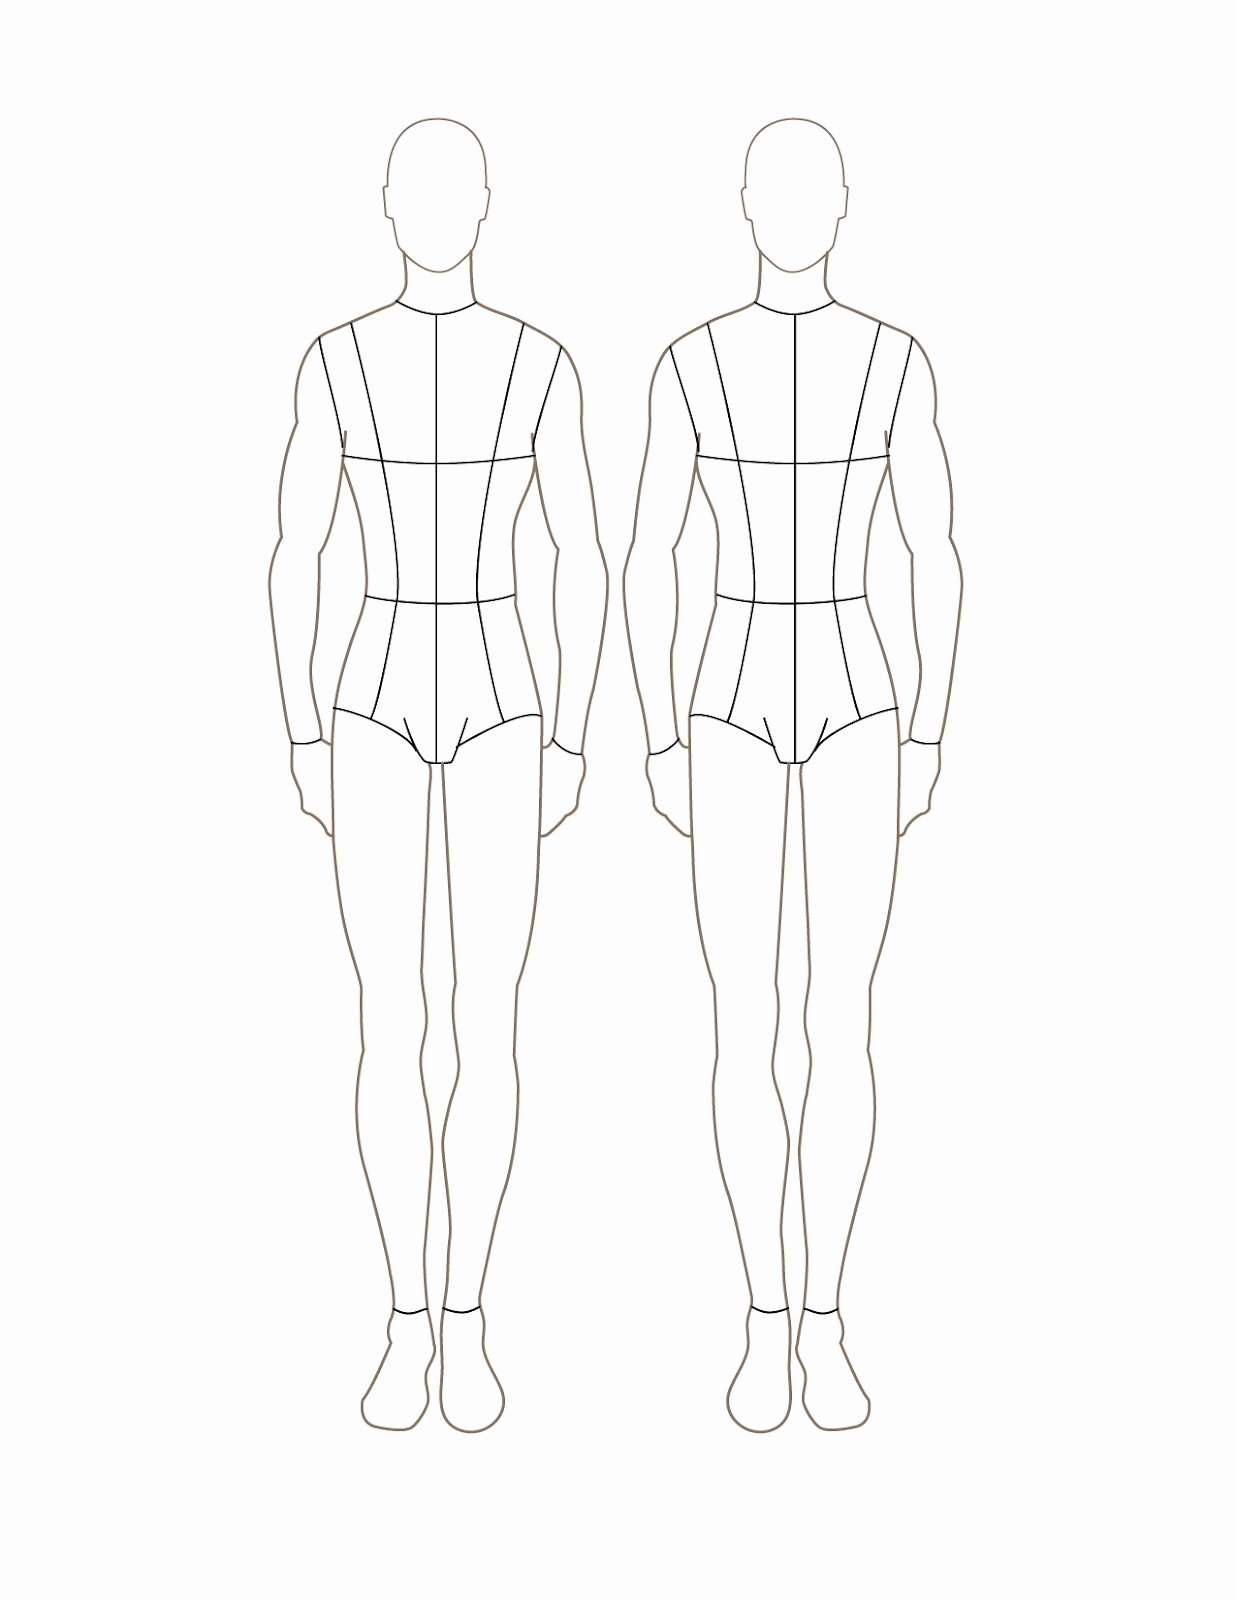 Model Sketch Template Lovely Fashion Design Sketch Model Male